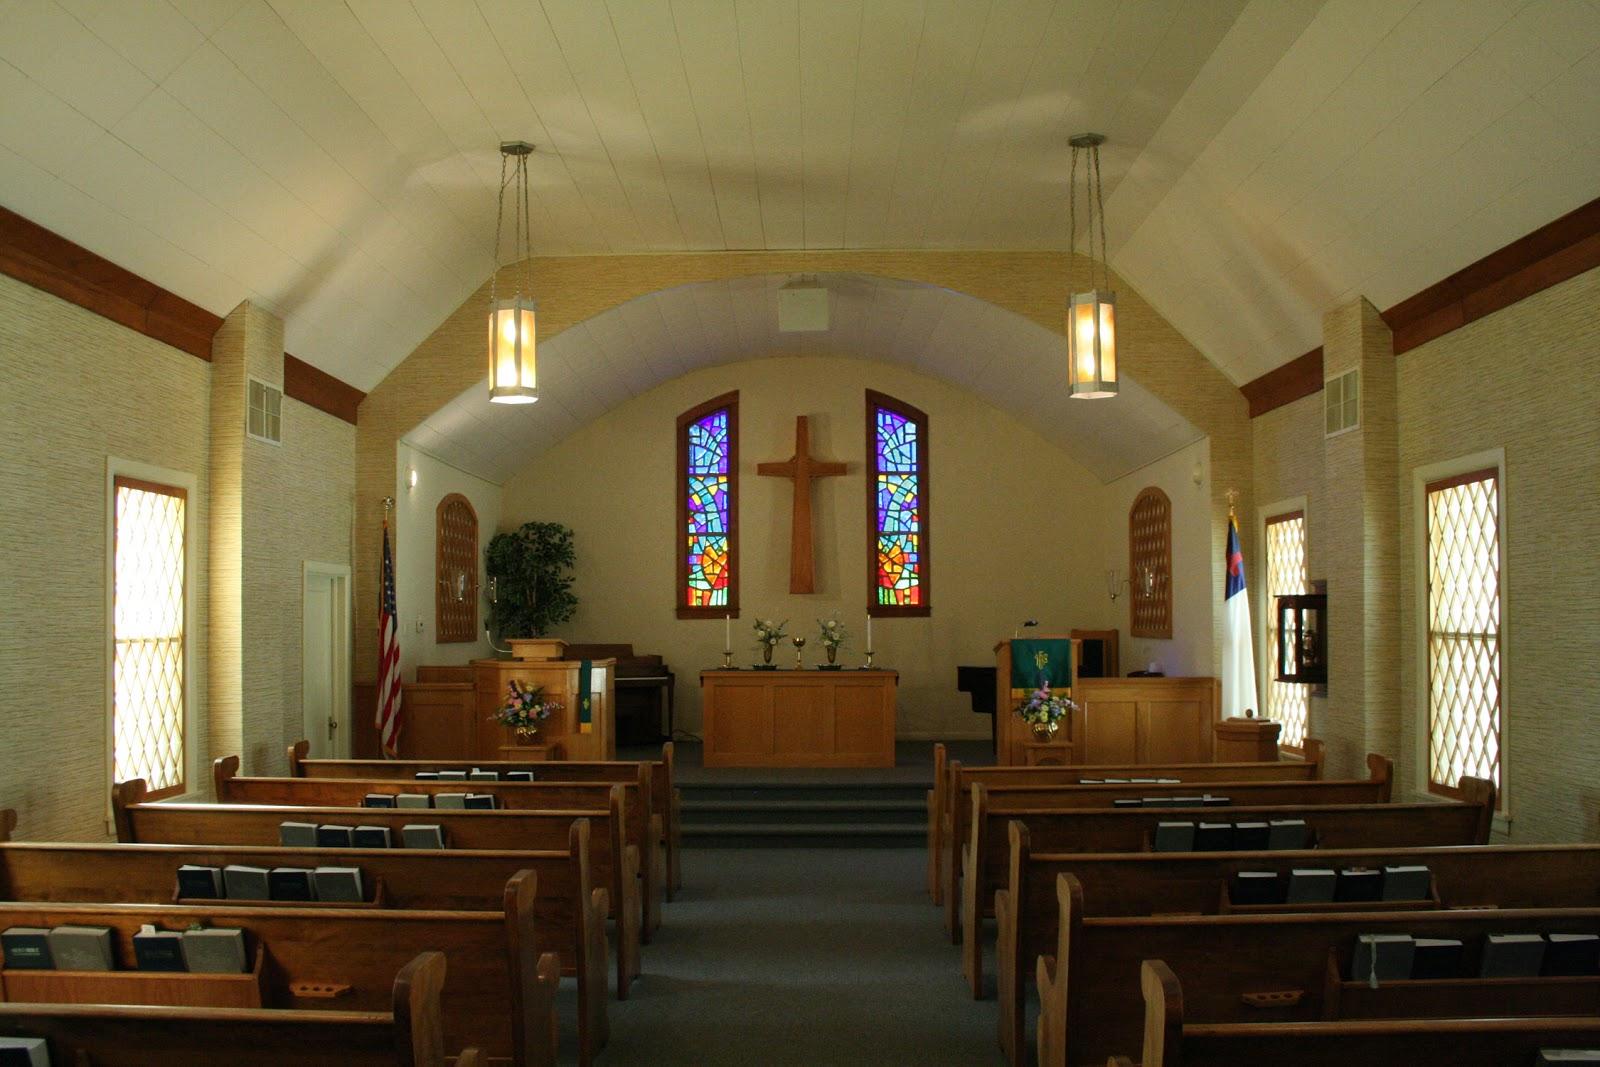 awesome small church sanctuary design ideas images decorating - Church Interior Design Ideas